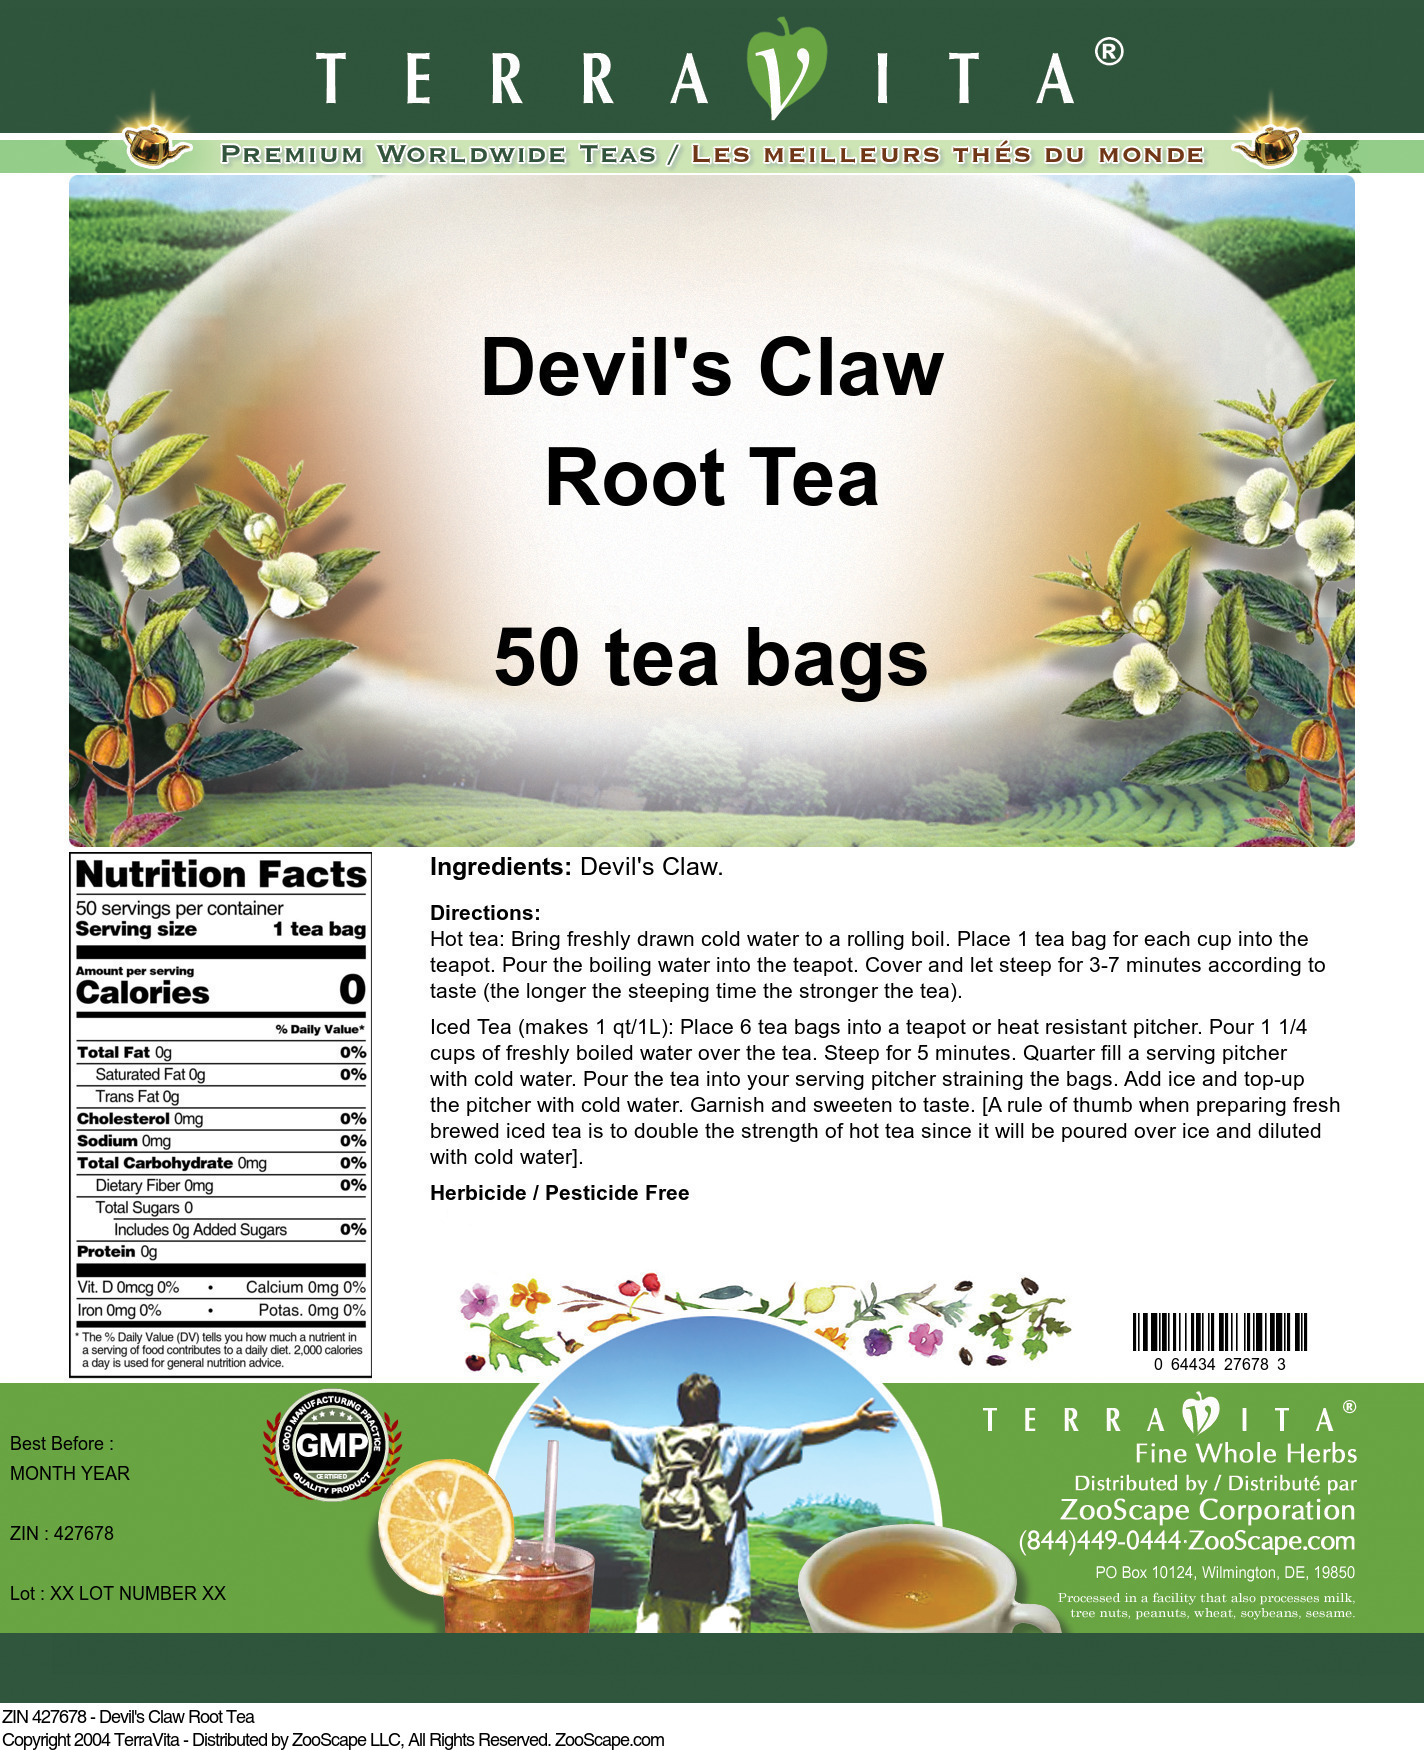 Devil's Claw Root Tea - Label